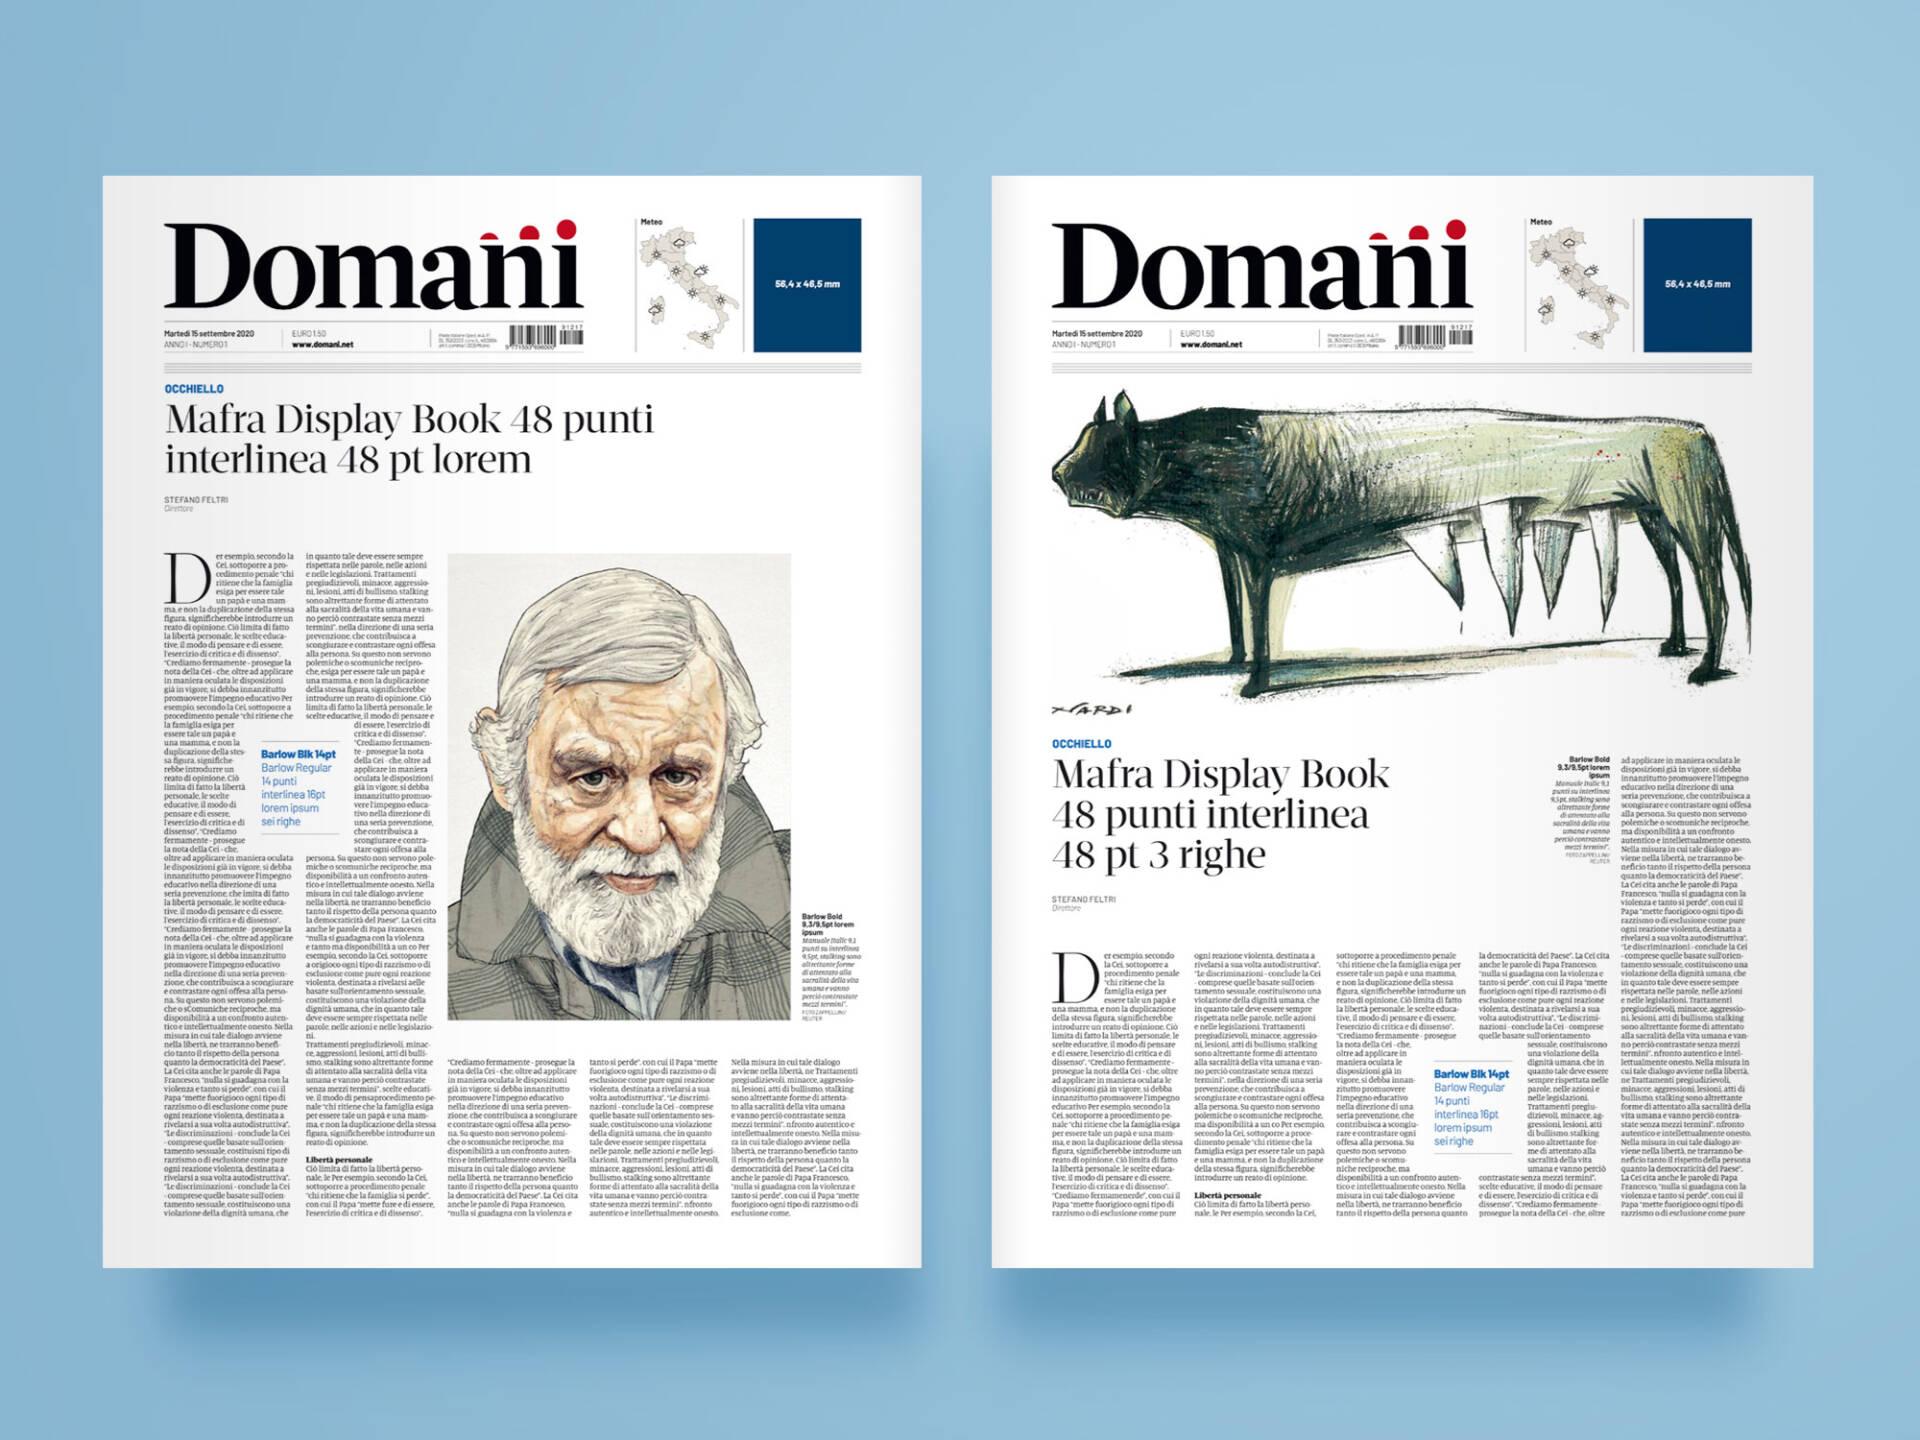 Domani_Print_Frontpage_Wenceslau_News_Design07